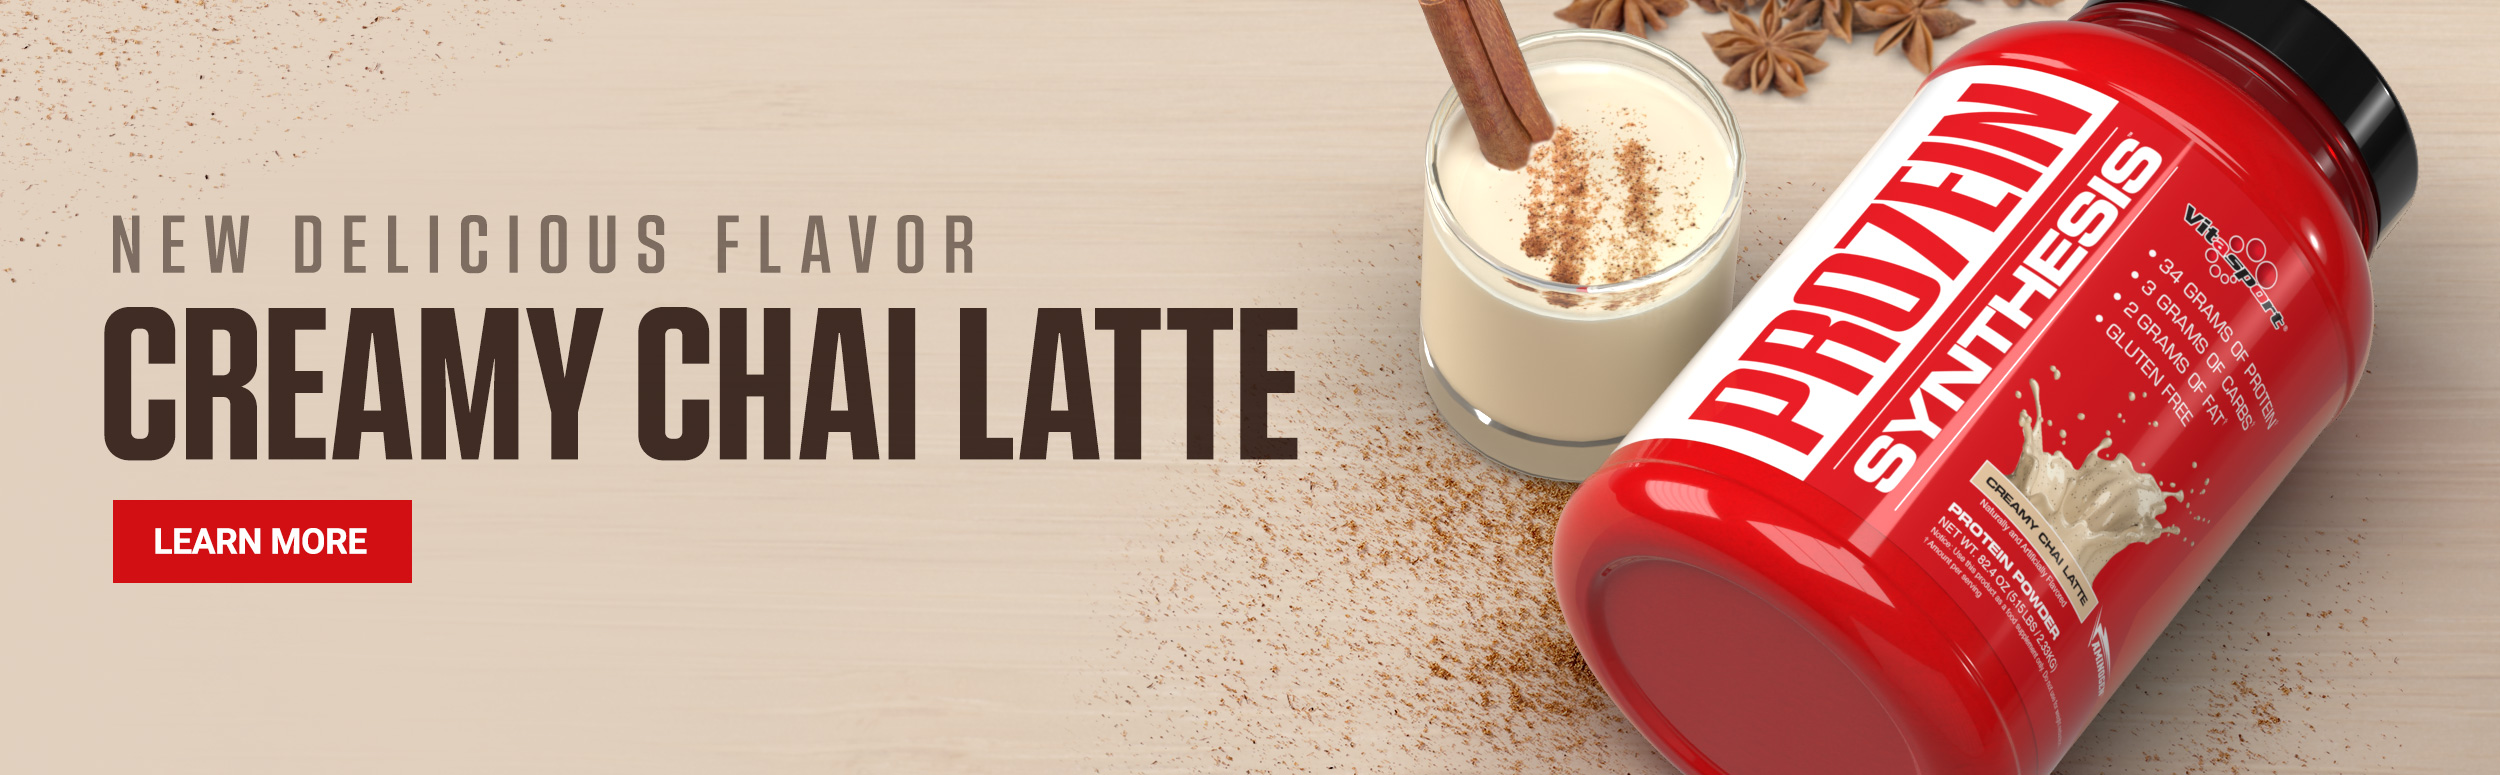 Creamy Chai Latte PRO7EIN Synthesis Banner